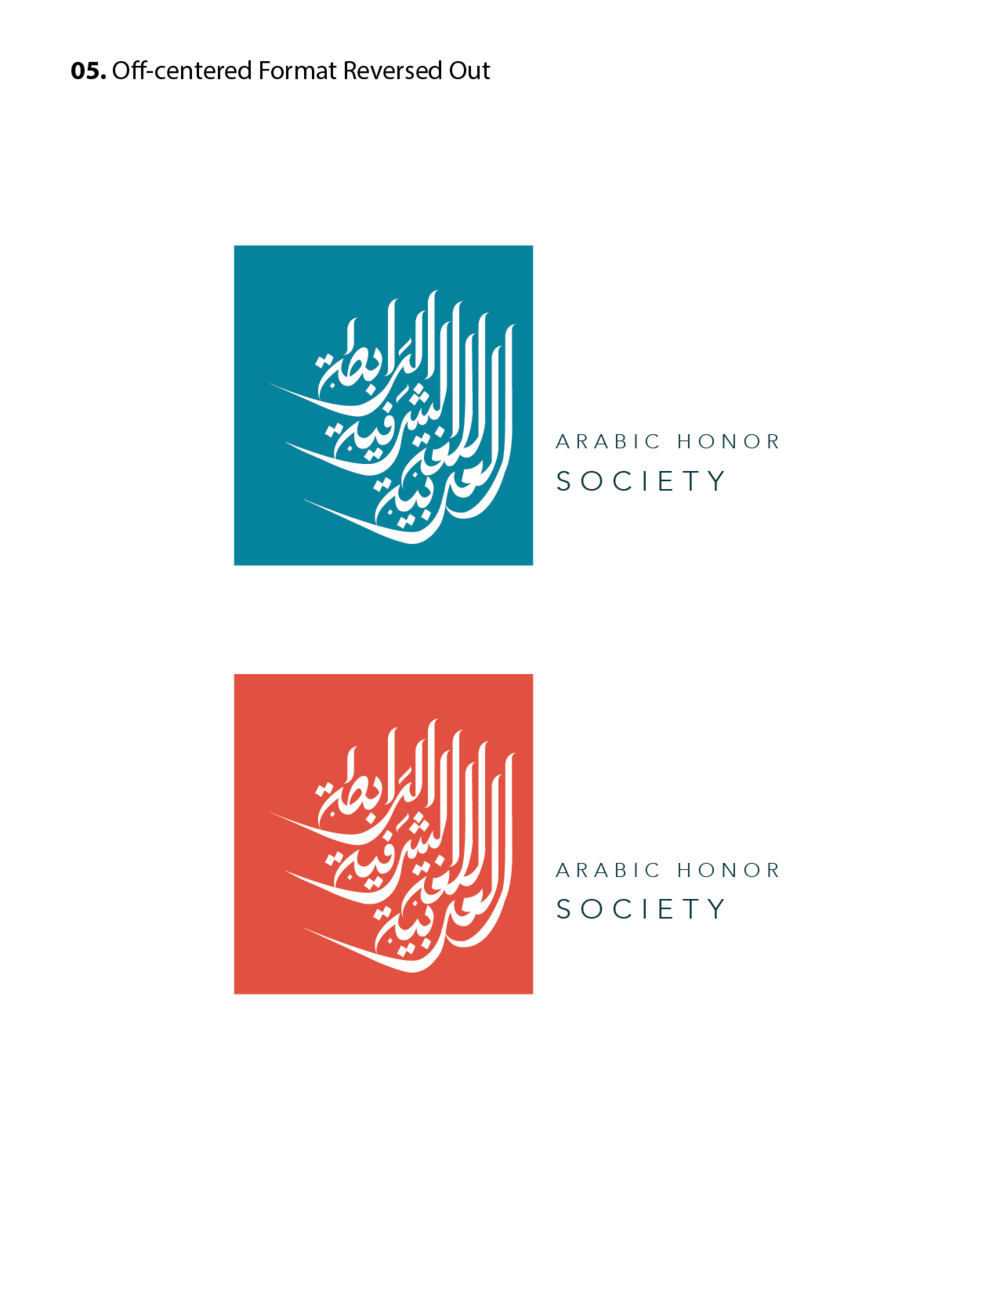 Logo-AHS-05.png